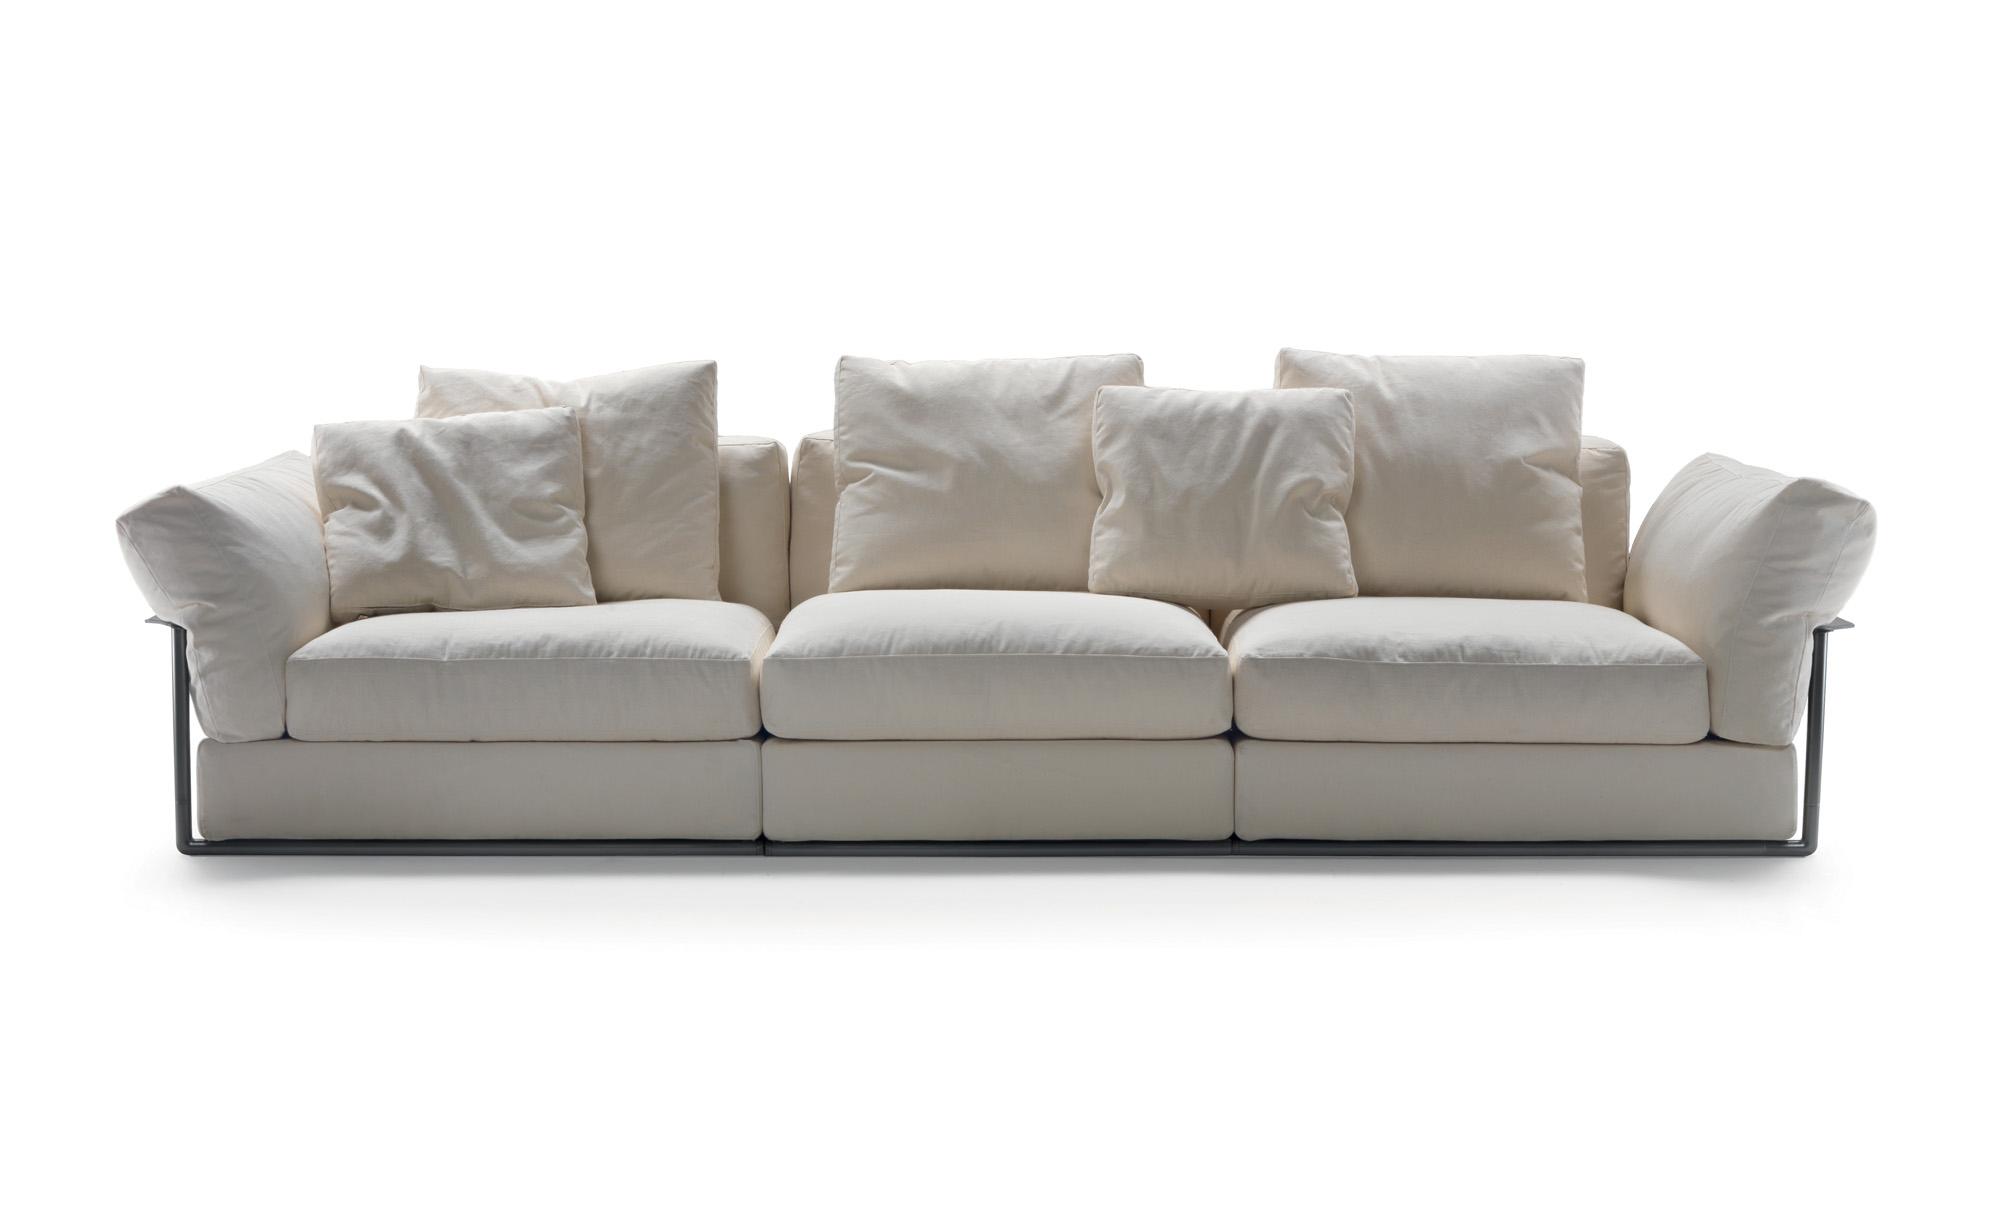 Cheap sofas melbourne australia for Cheap modern furniture melbourne